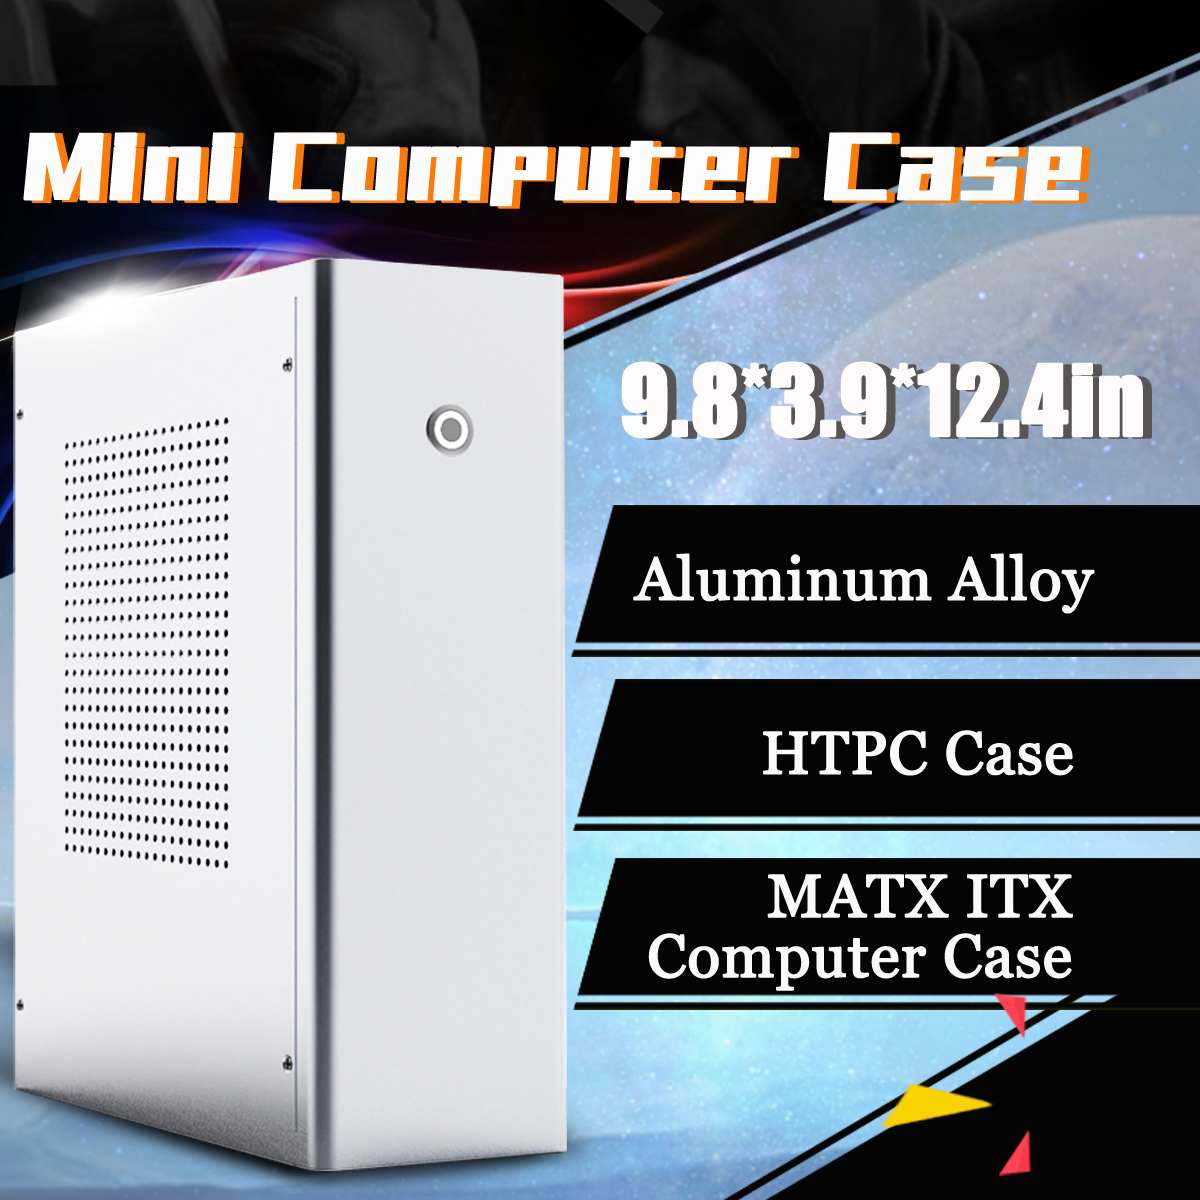 LEORY M1 Aluminum Alloy mATX ITX  Computer Case HTPC Case Support 1U Flex Power Supply 250x100x315mm Super Thin Body Design computer case